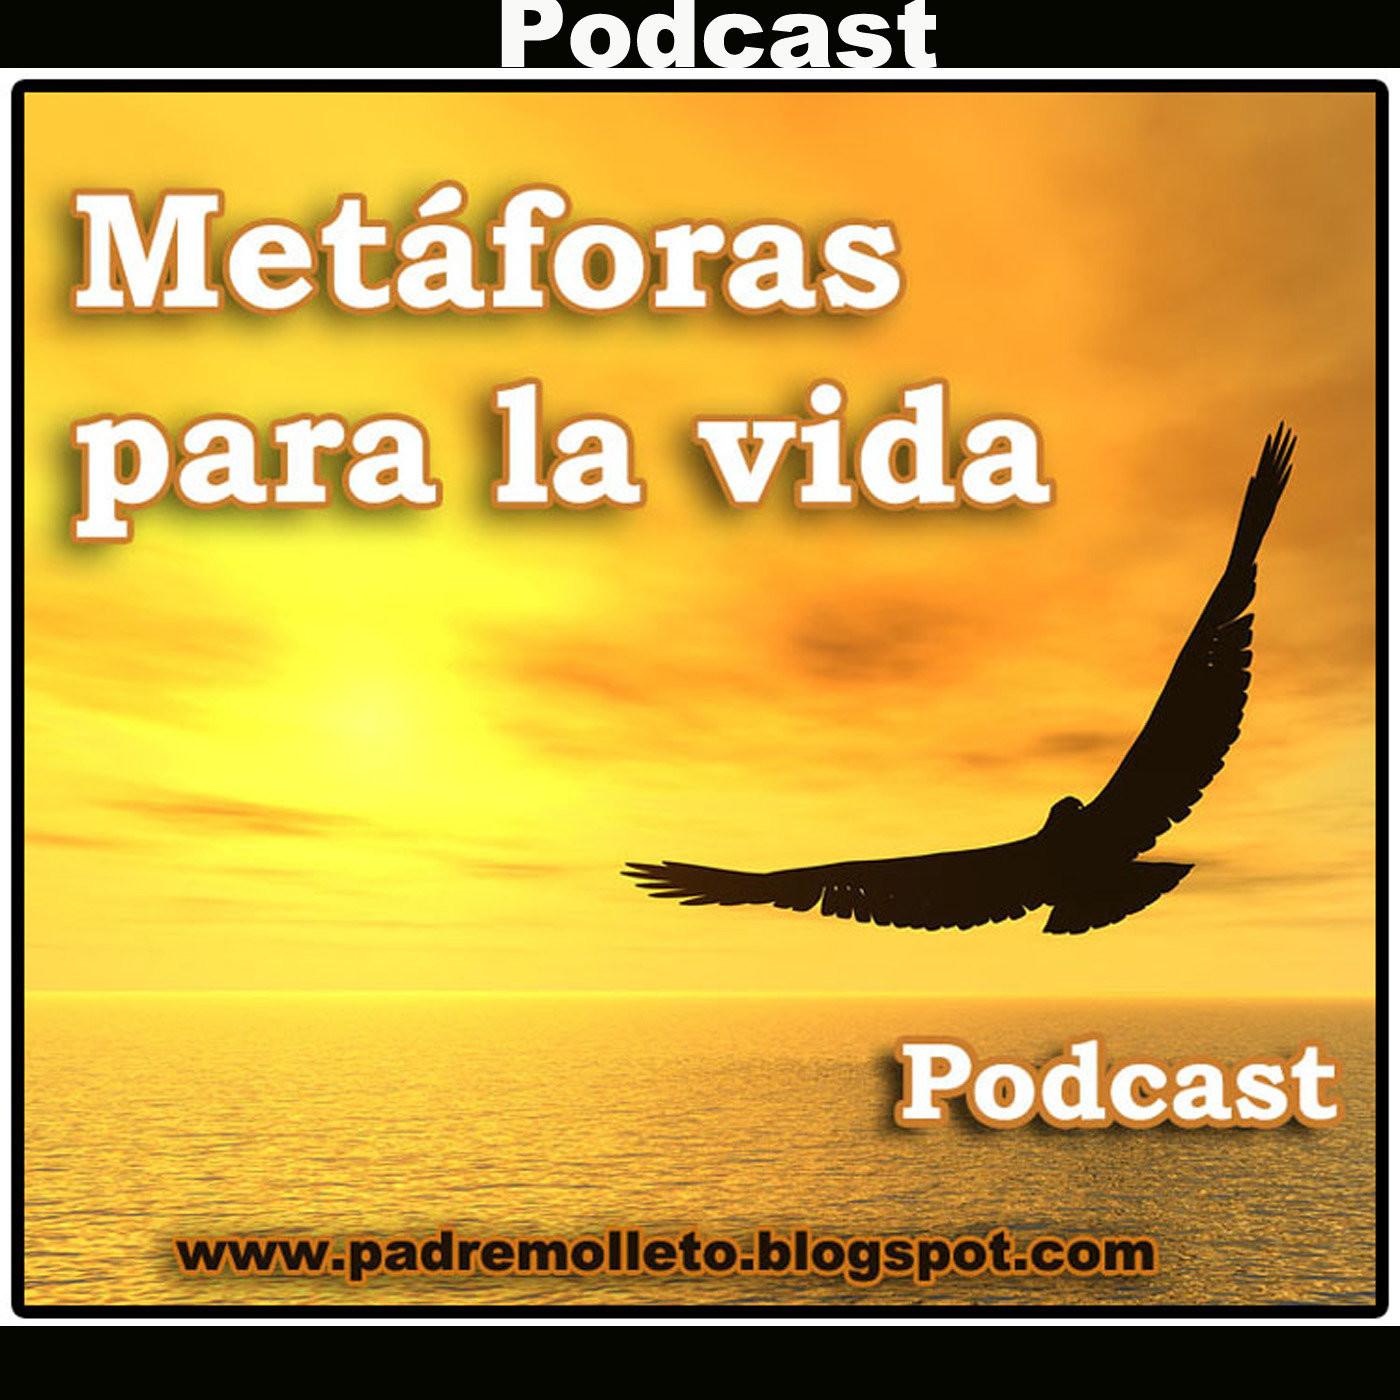 El pañuelo METAFORA podcast  en Podcast Metaforas para la